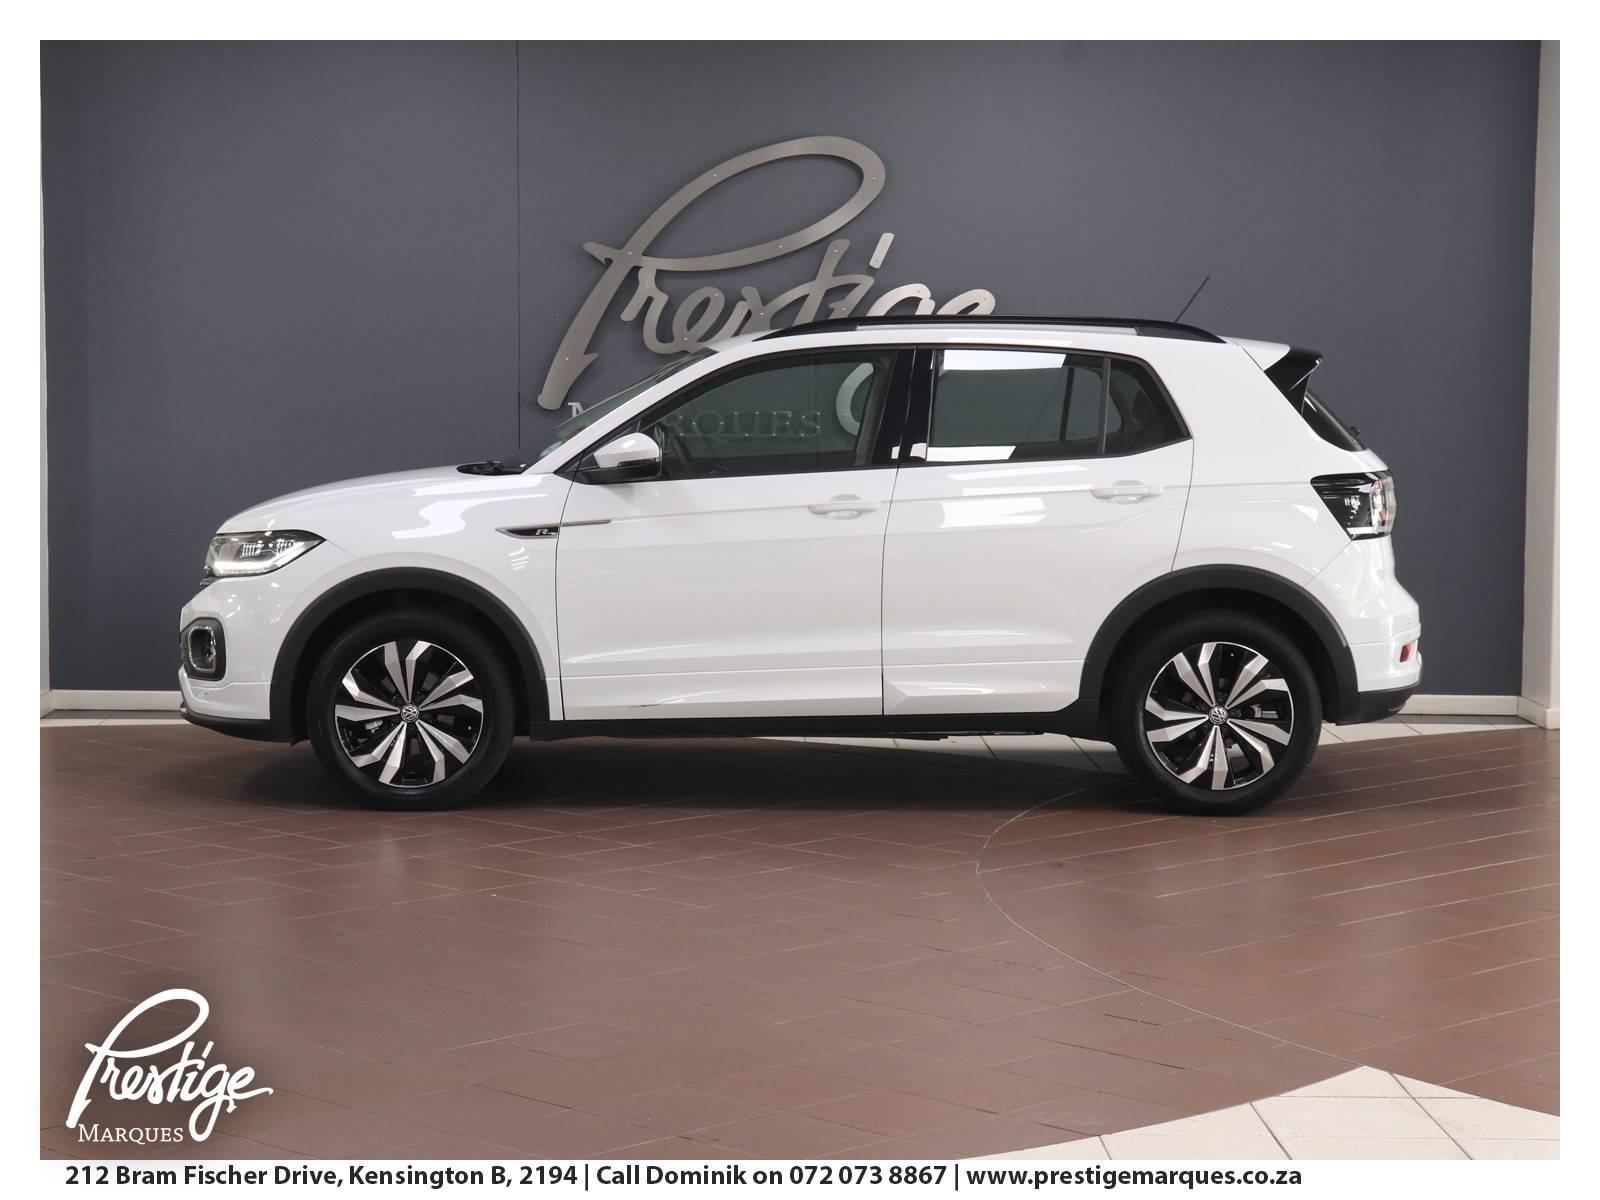 2019-Volkswagen-T-Cross-Prestige-Marques-Randburg-Sandton-6